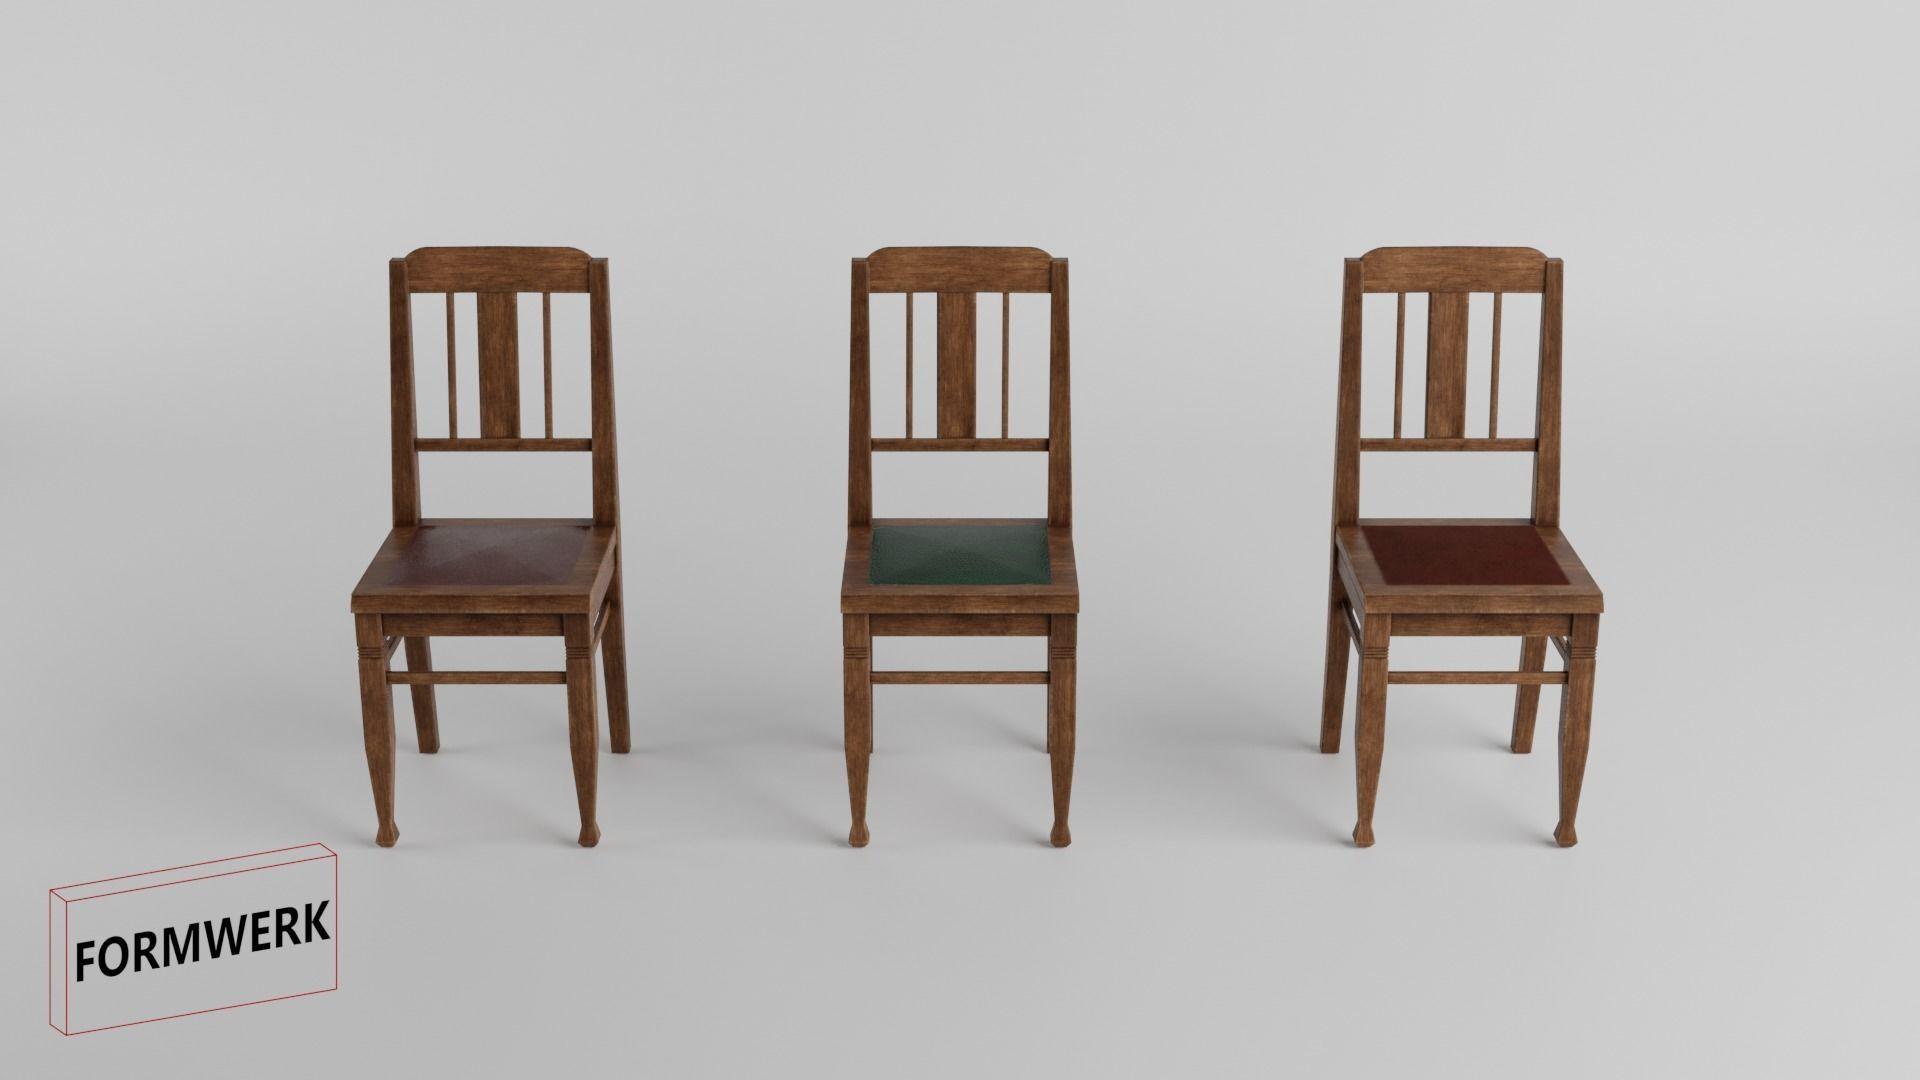 historic furniture Set 01 - 3D Low Poly